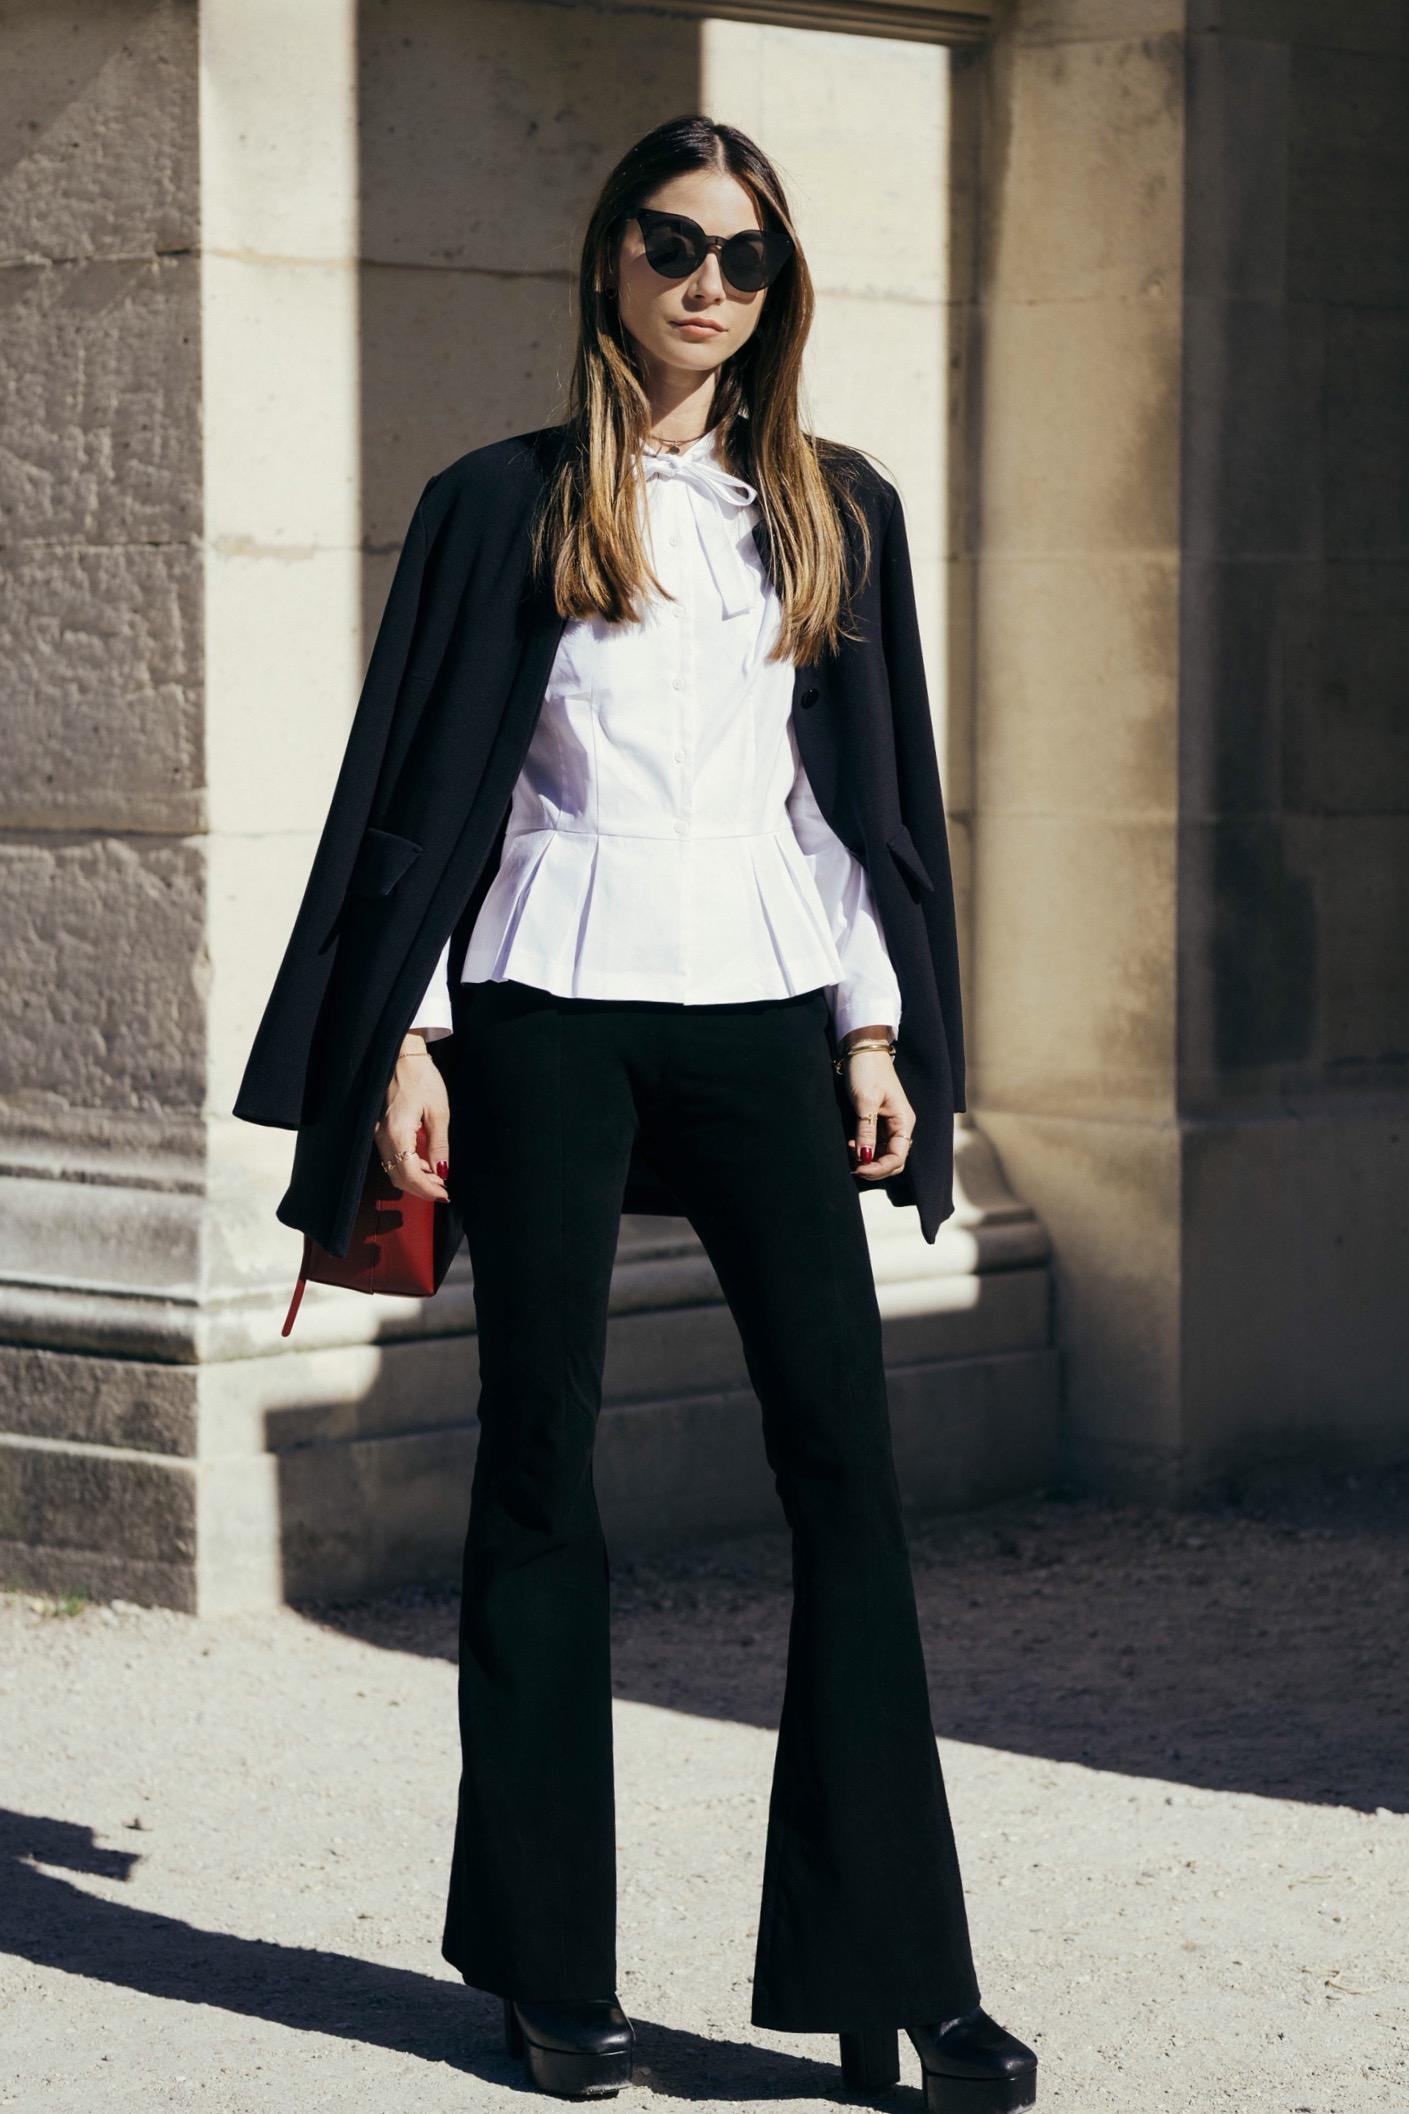 ays_yuva_steffen_schraut_leather_pants_shirt_blazer_art_youth_society_16